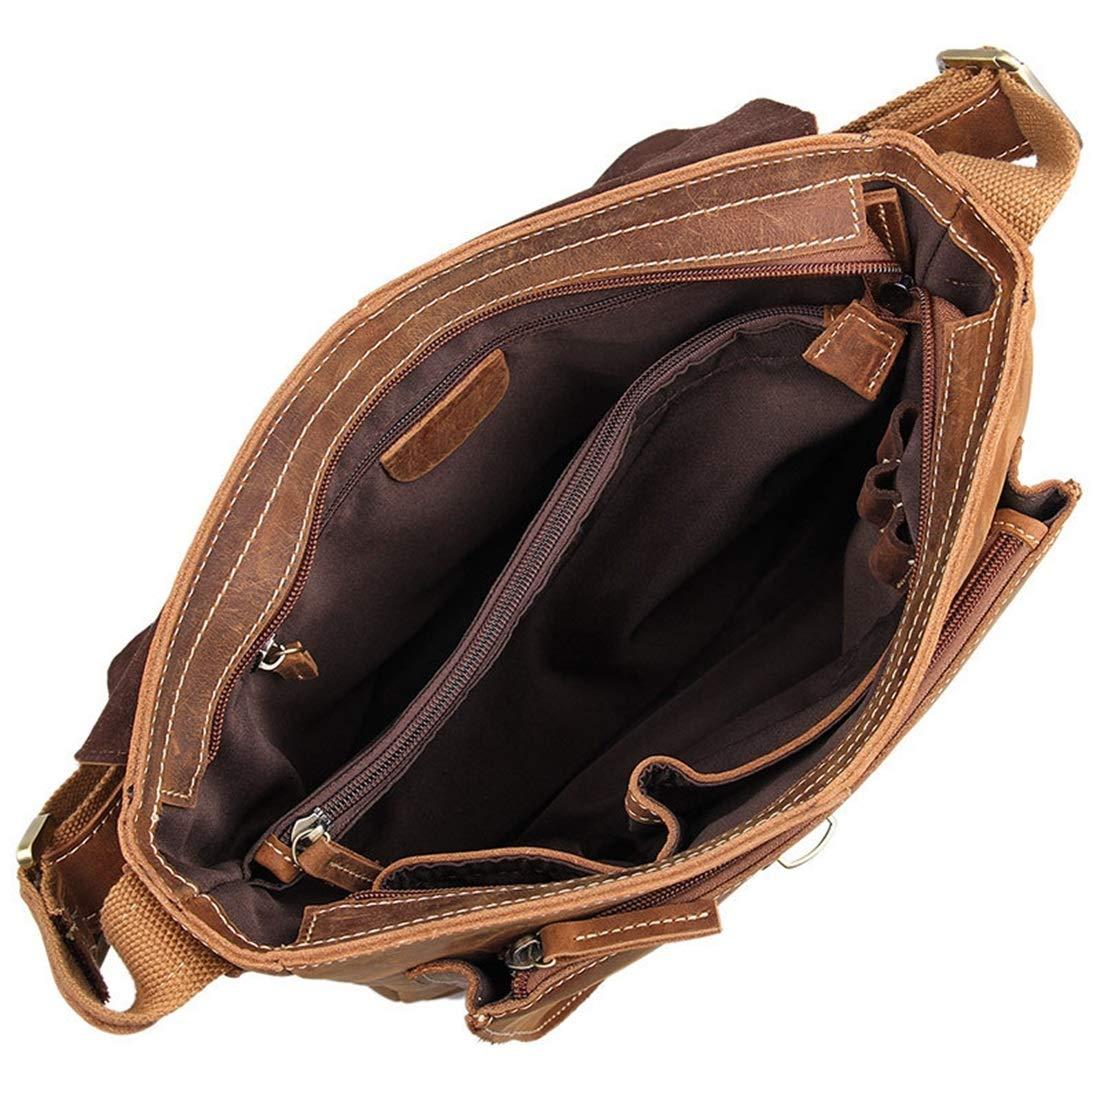 XIAMEND Mens Messenger Shoulder Bag Vintage Briefcase Crossbody Bag for School and Work Color : Brown